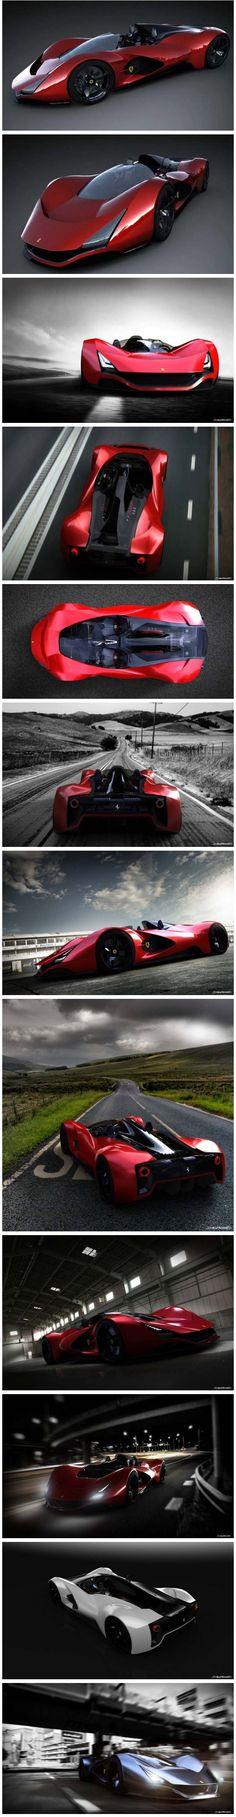 Ferrari Aliante, Such an amazing concept car. One of a kind!!